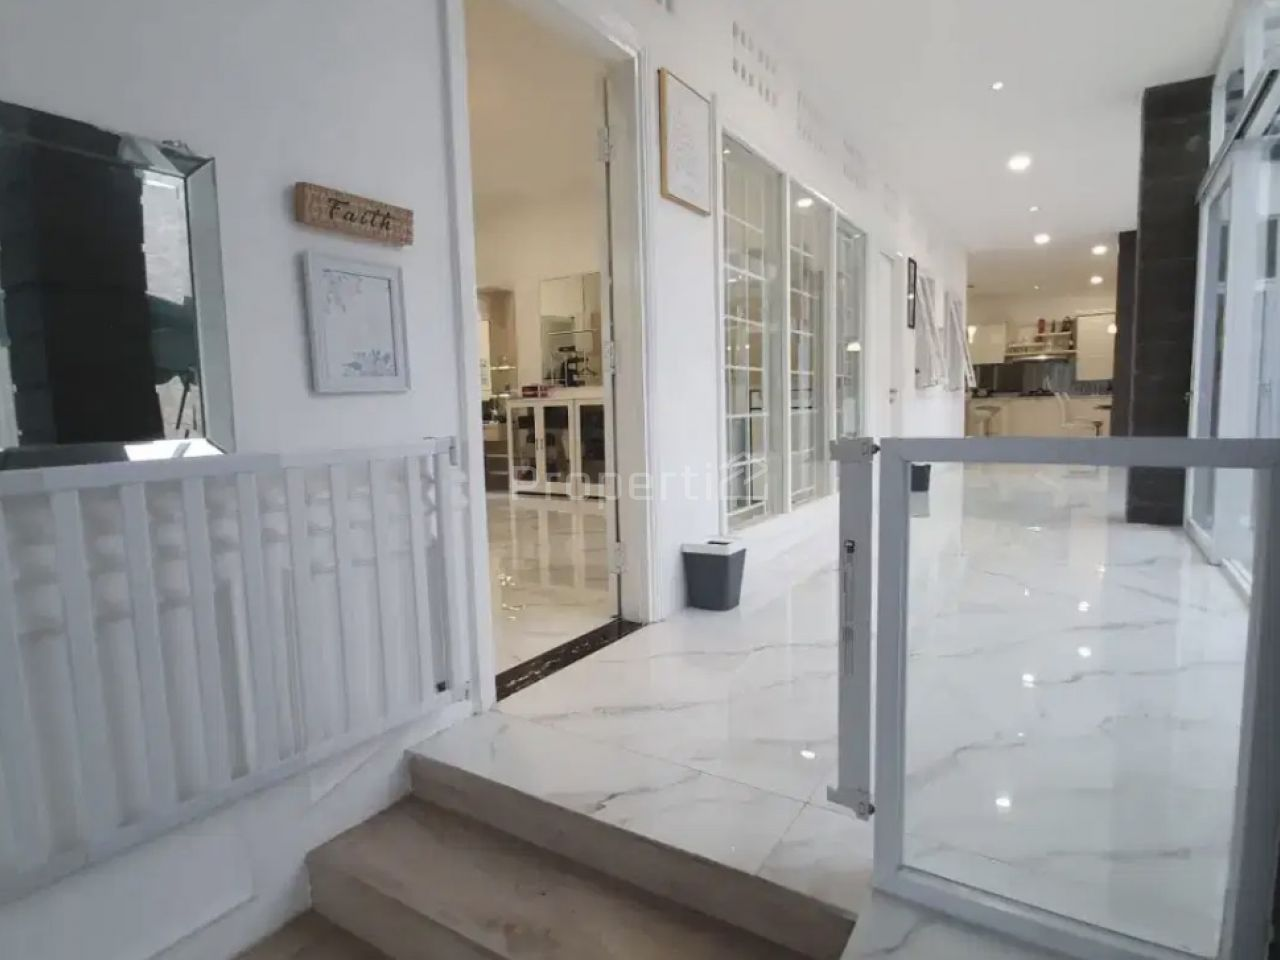 Rumah Mewah di Cipaku Indah, Bandung, Jawa Barat